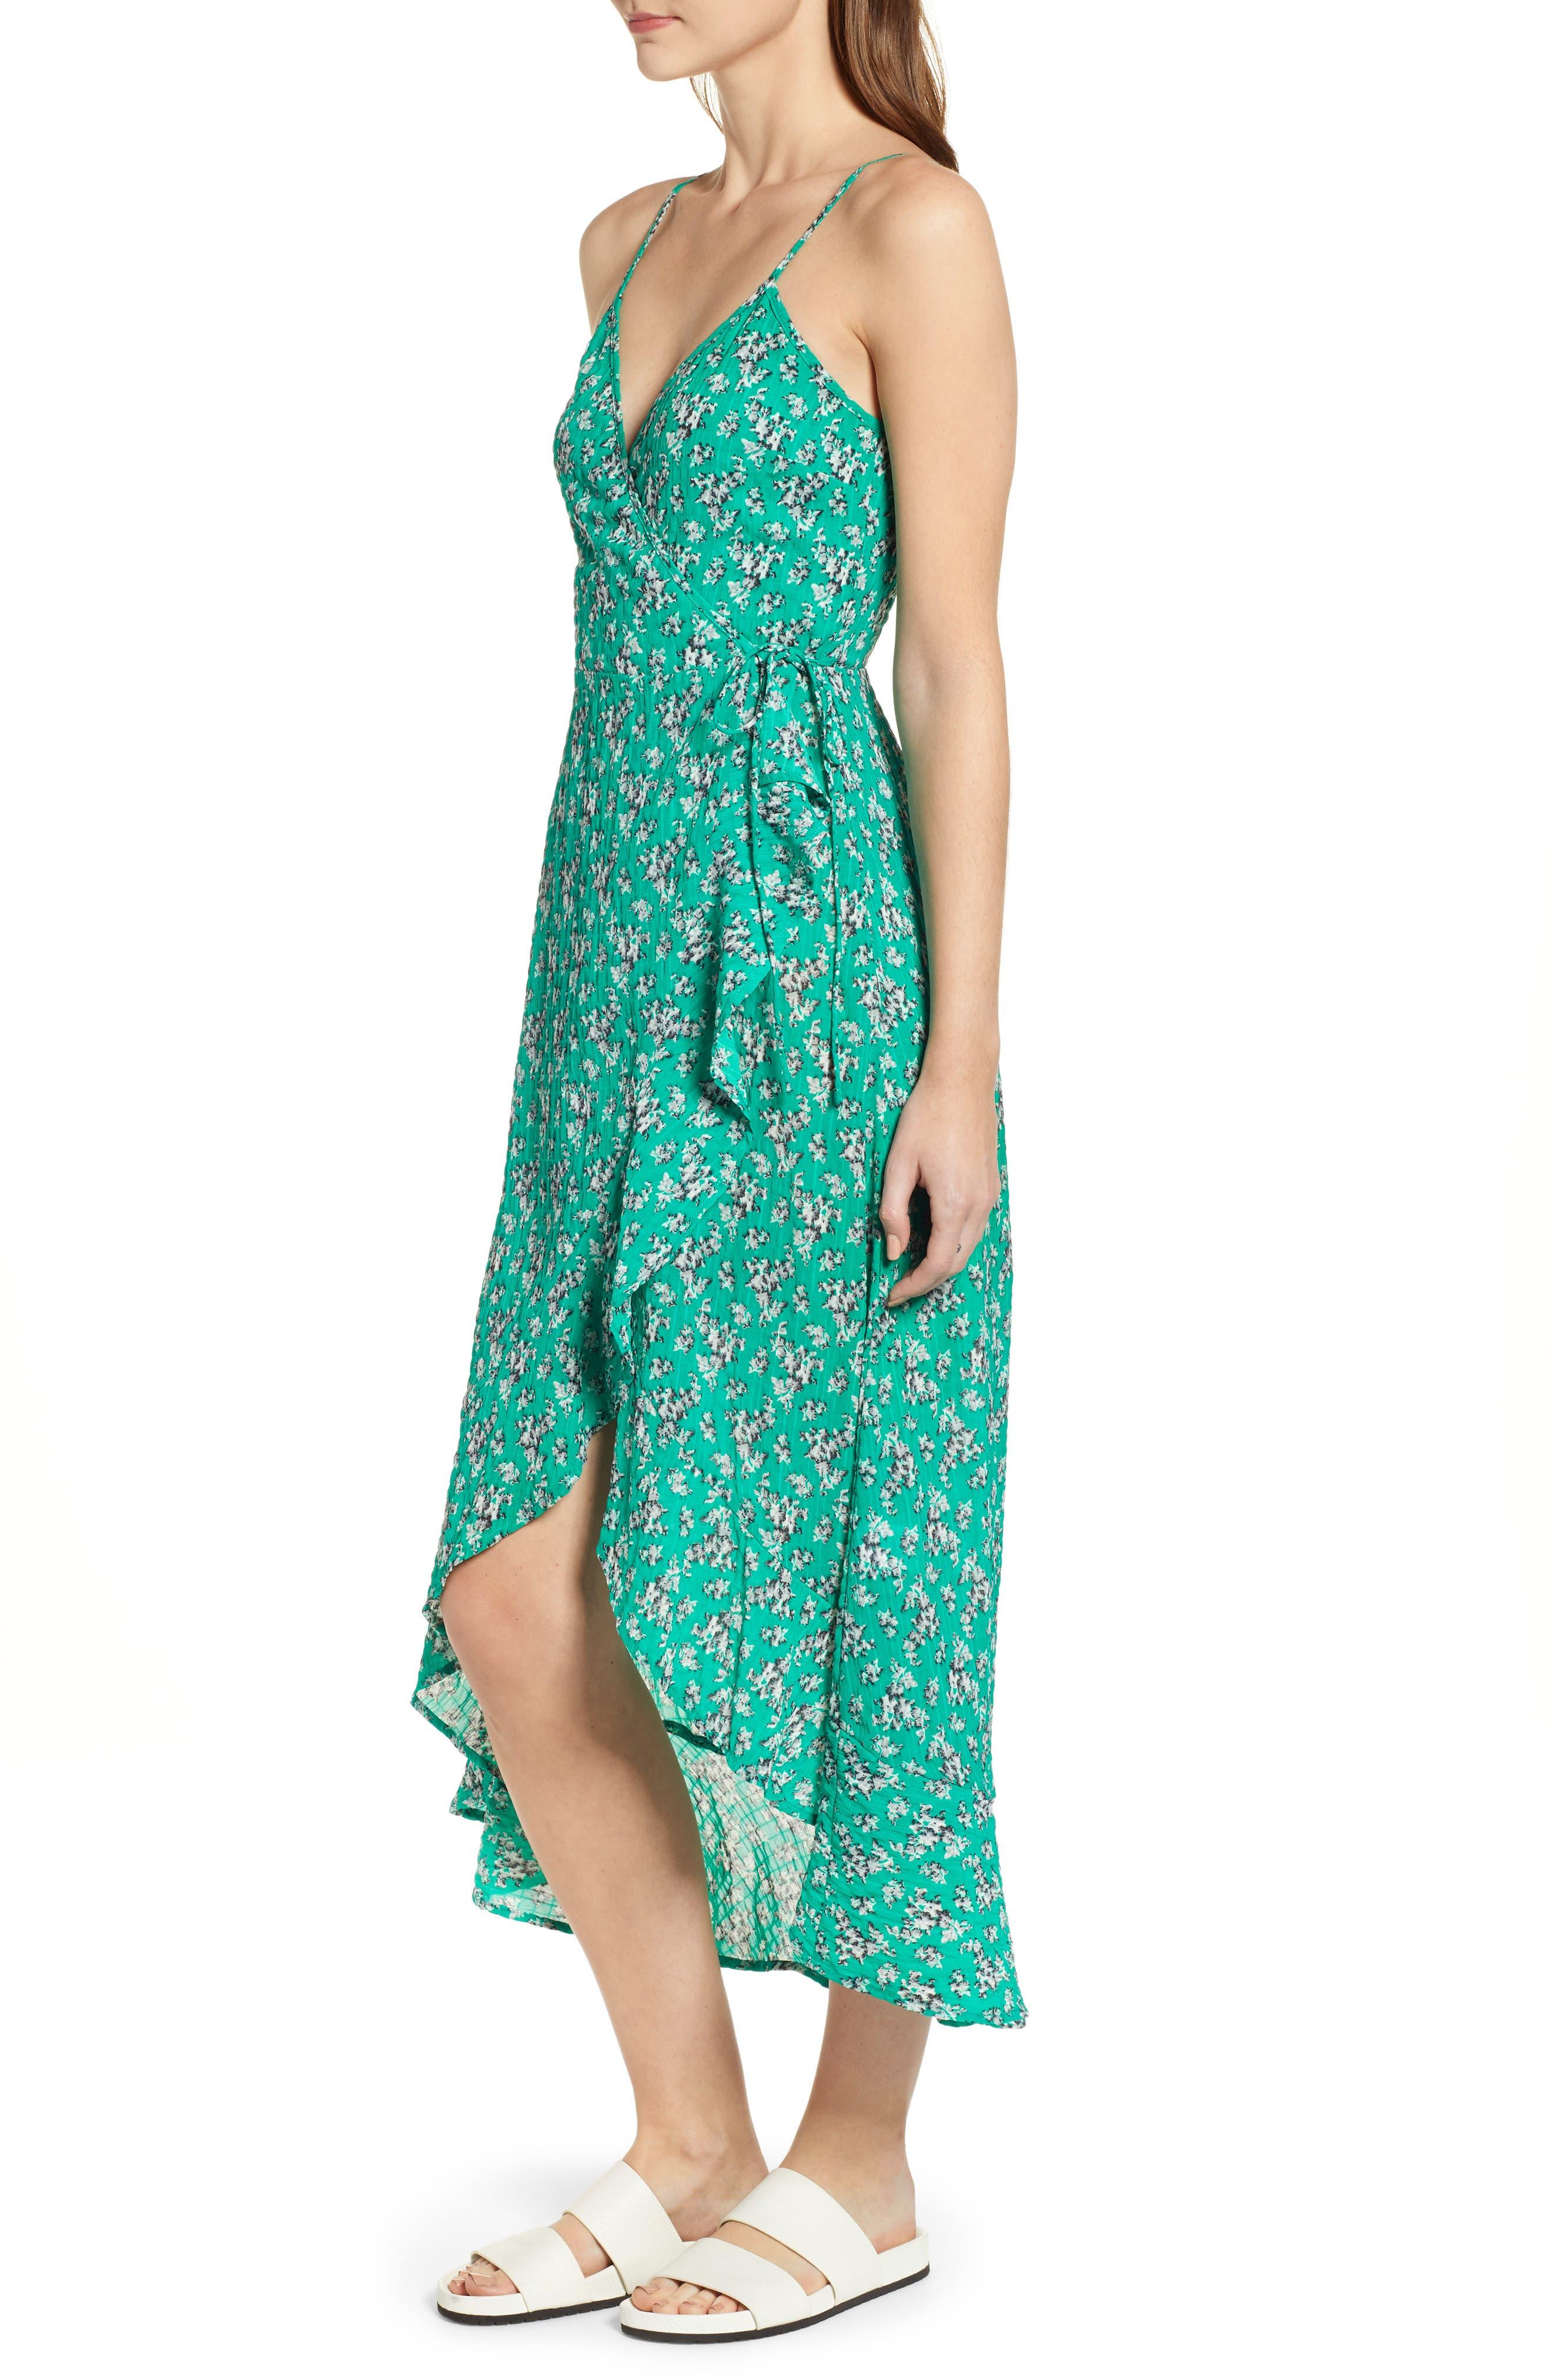 Adventurer Floral Print High/Low Dress,                             Alternate thumbnail 3, color,                             GREEN FLORAL